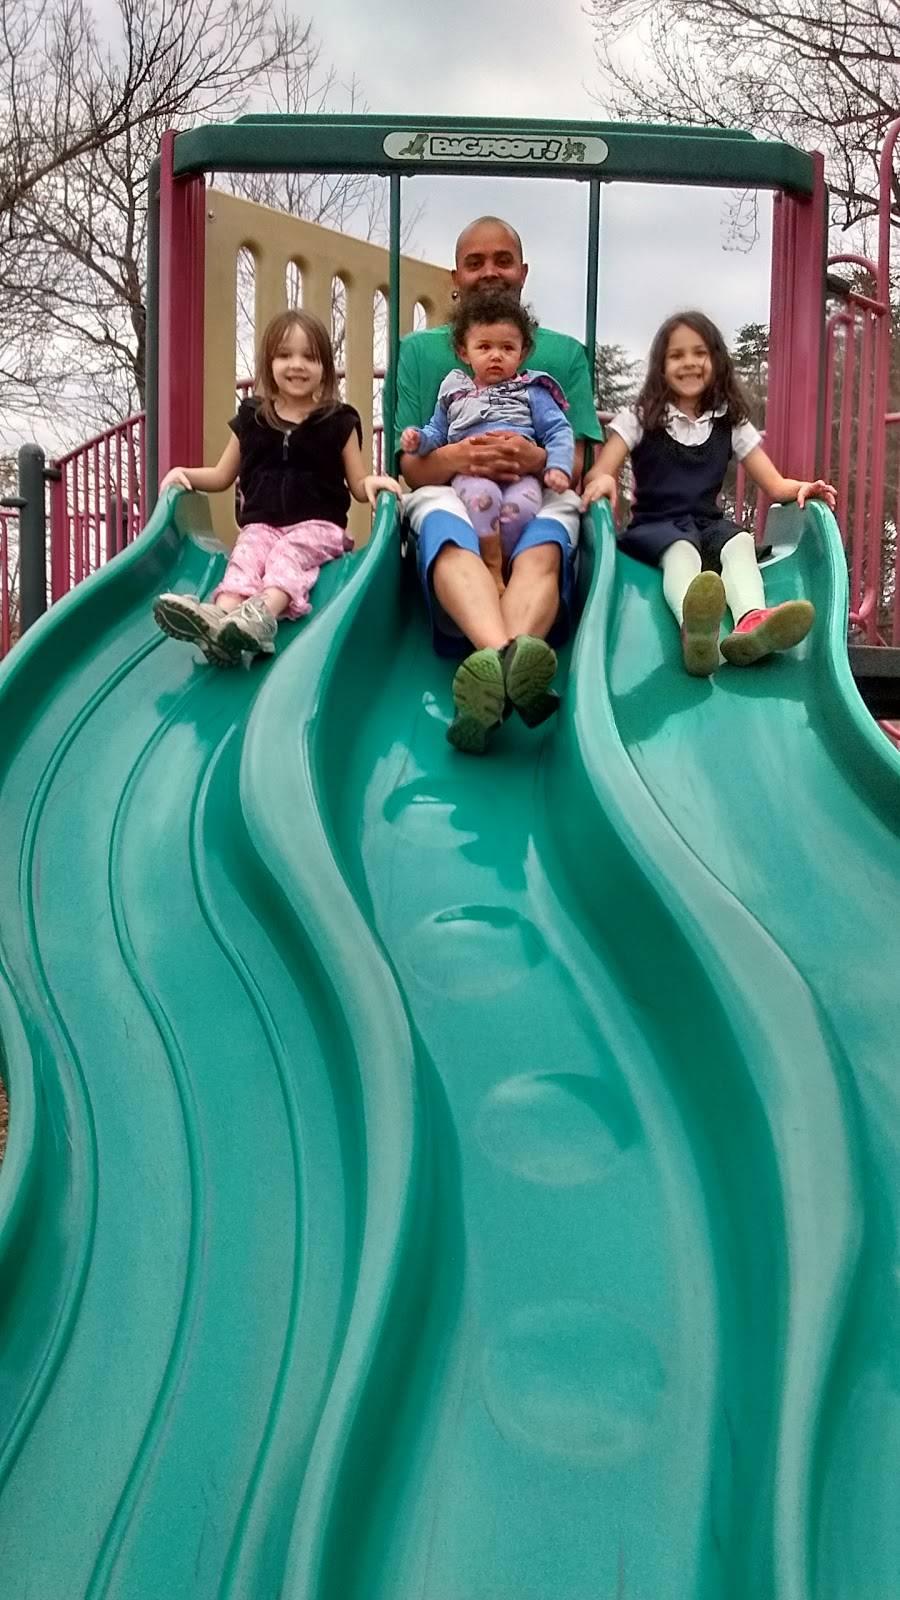 Highview Park - park  | Photo 5 of 10 | Address: 7201 Outer Loop, Louisville, KY 40228, USA | Phone: (502) 601-2318